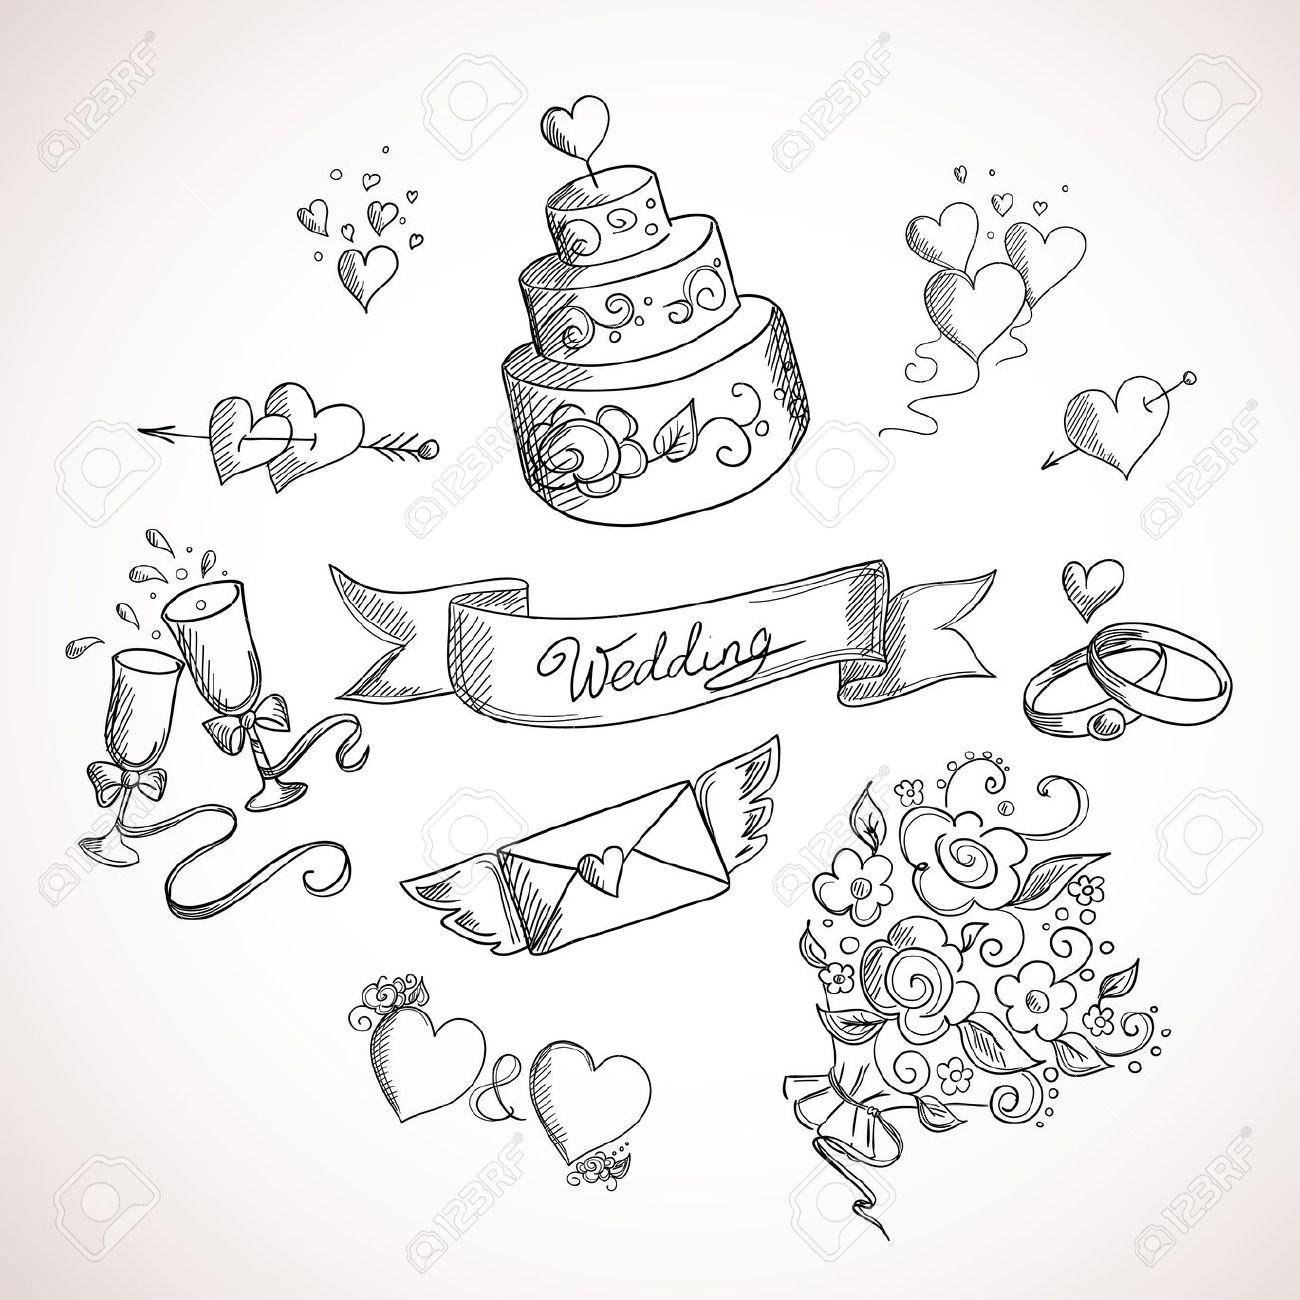 1300x1300 Sketch Of Wedding Design Elements. Hand Drawn Illustration Royalty